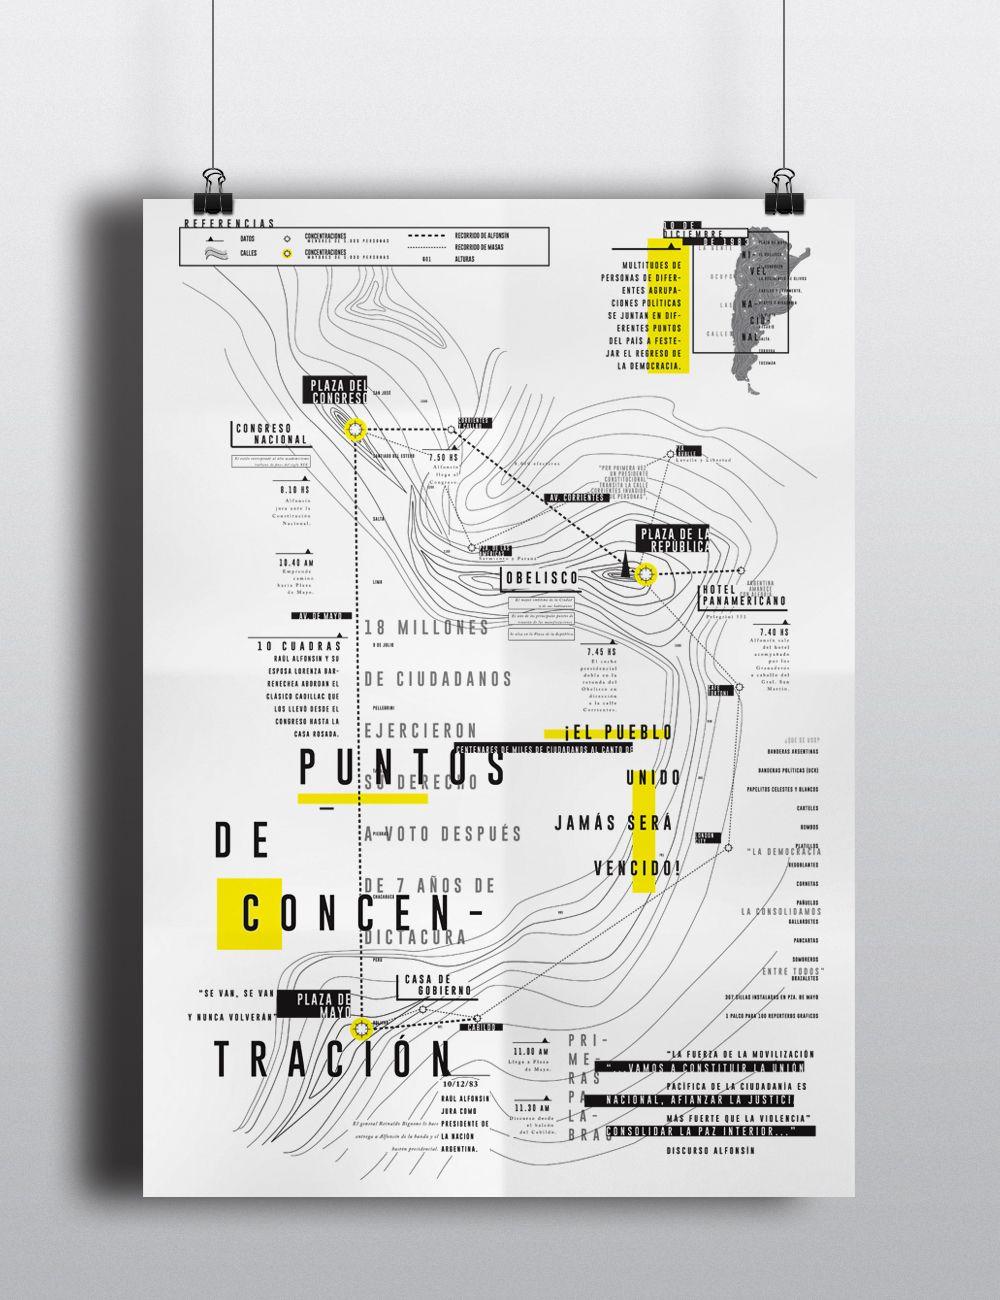 Micaela Castellaro (2014): Vuelta de la Democracia Argentina, via behance.net